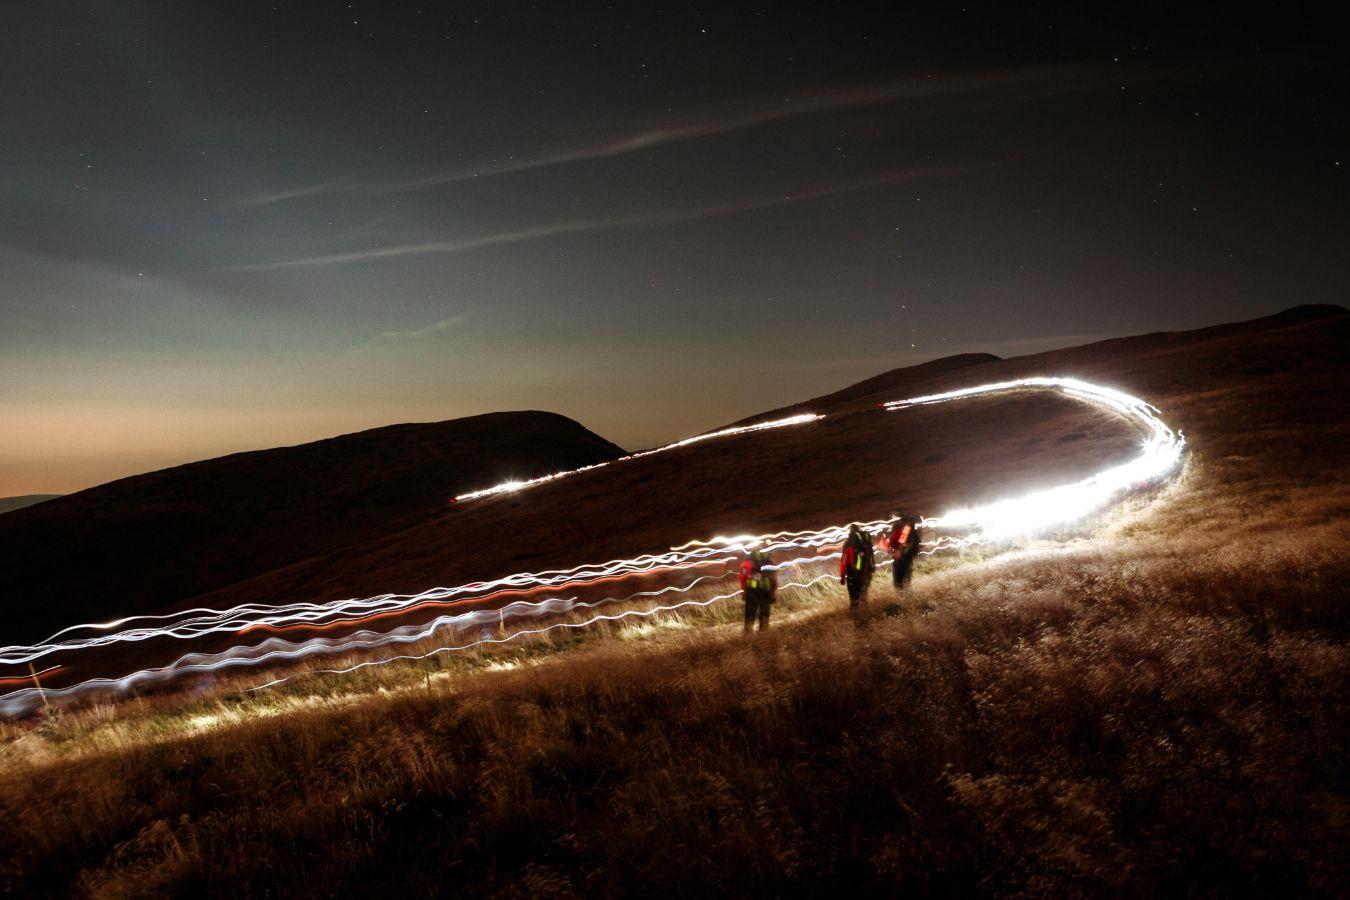 MOON FEST 2020 Stara planina | Uspon na Midžor u noći punog meseca | 29-30.  avgust 2020.